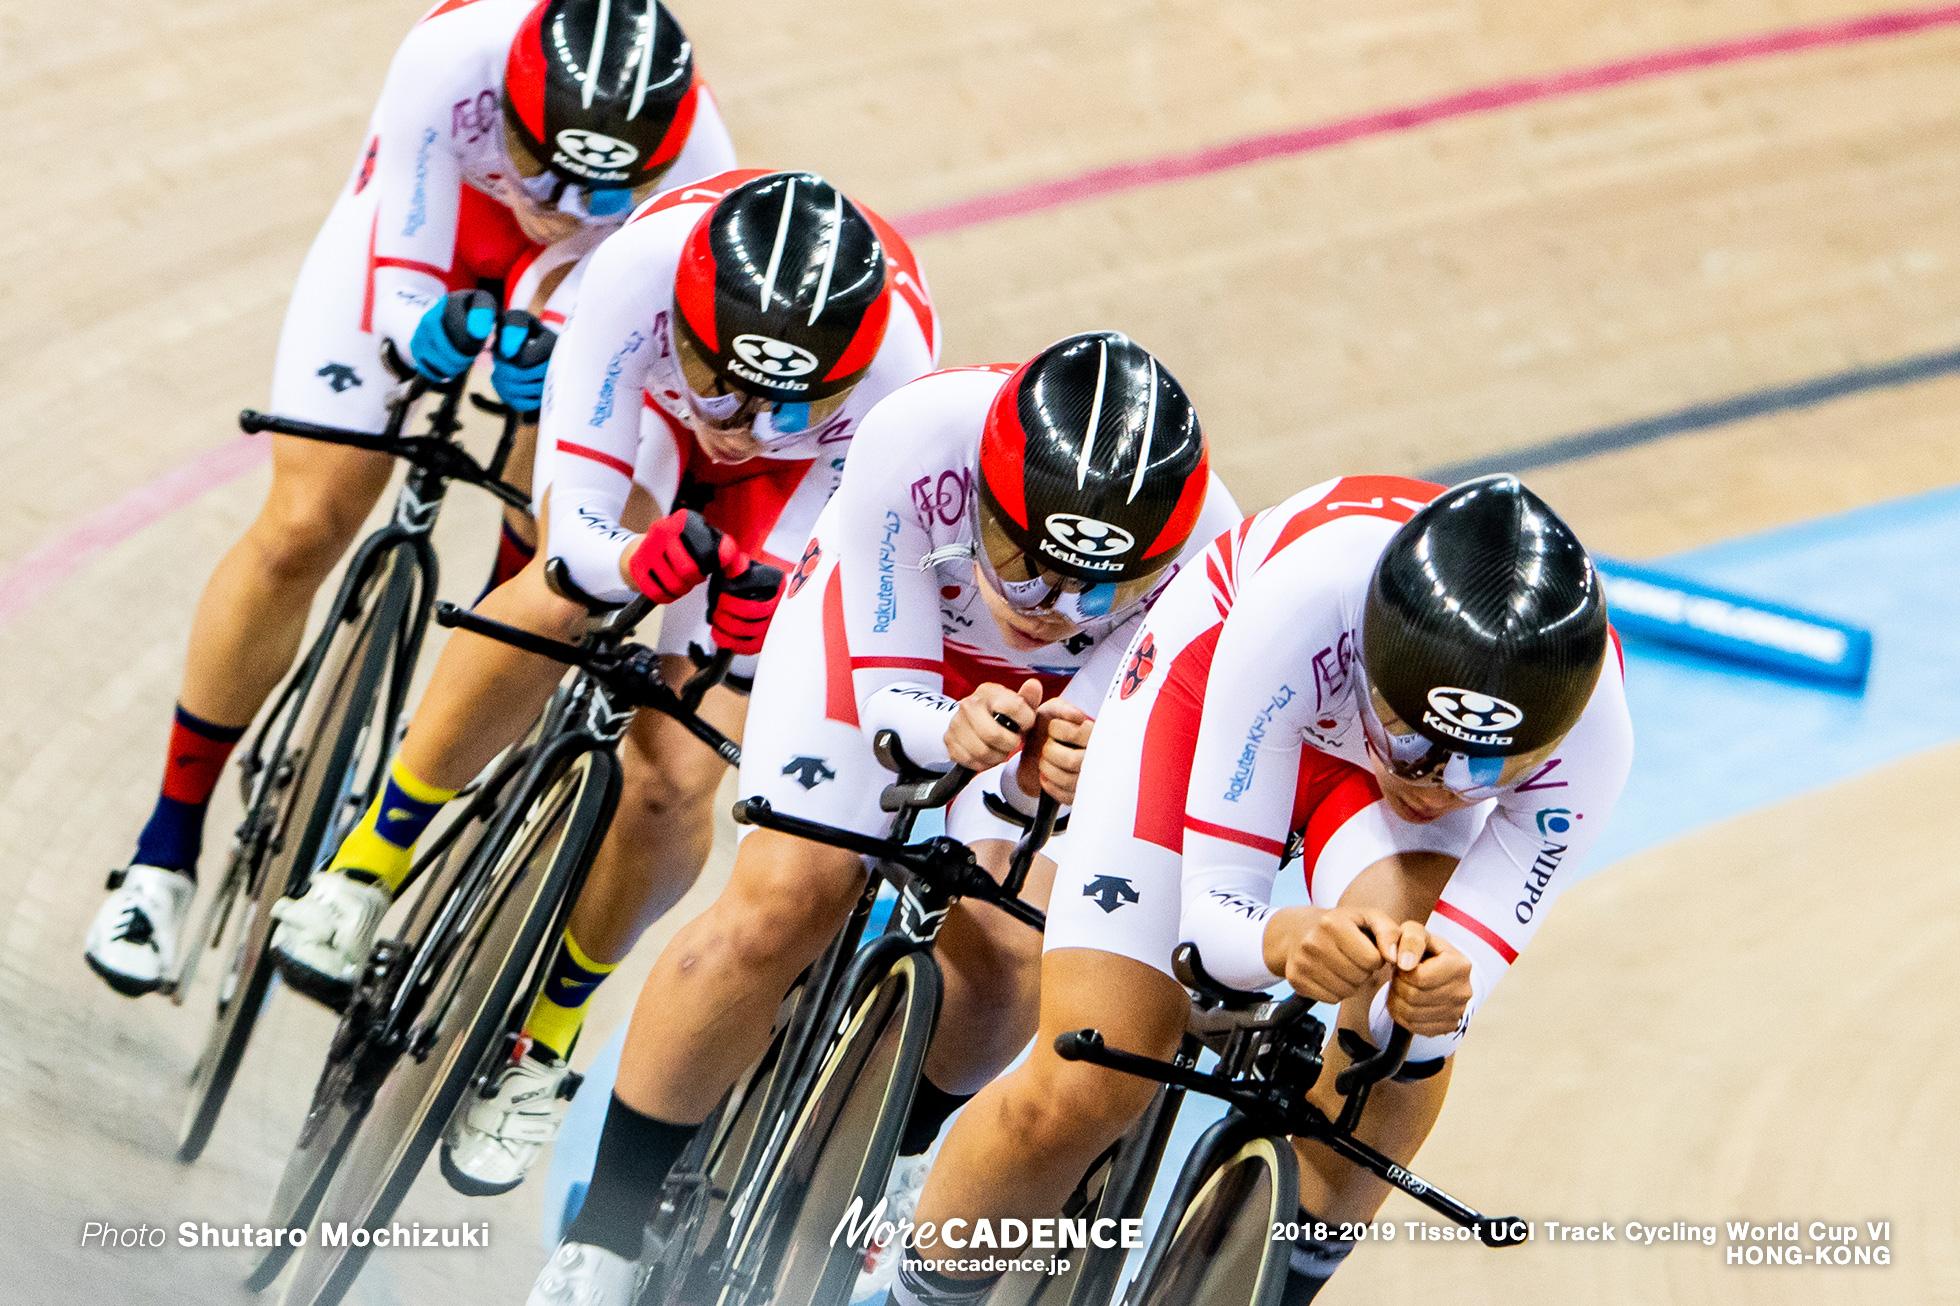 Qualifying / Women's Team Pursuit / Track Cycling World Cup VI / Hong-Kong